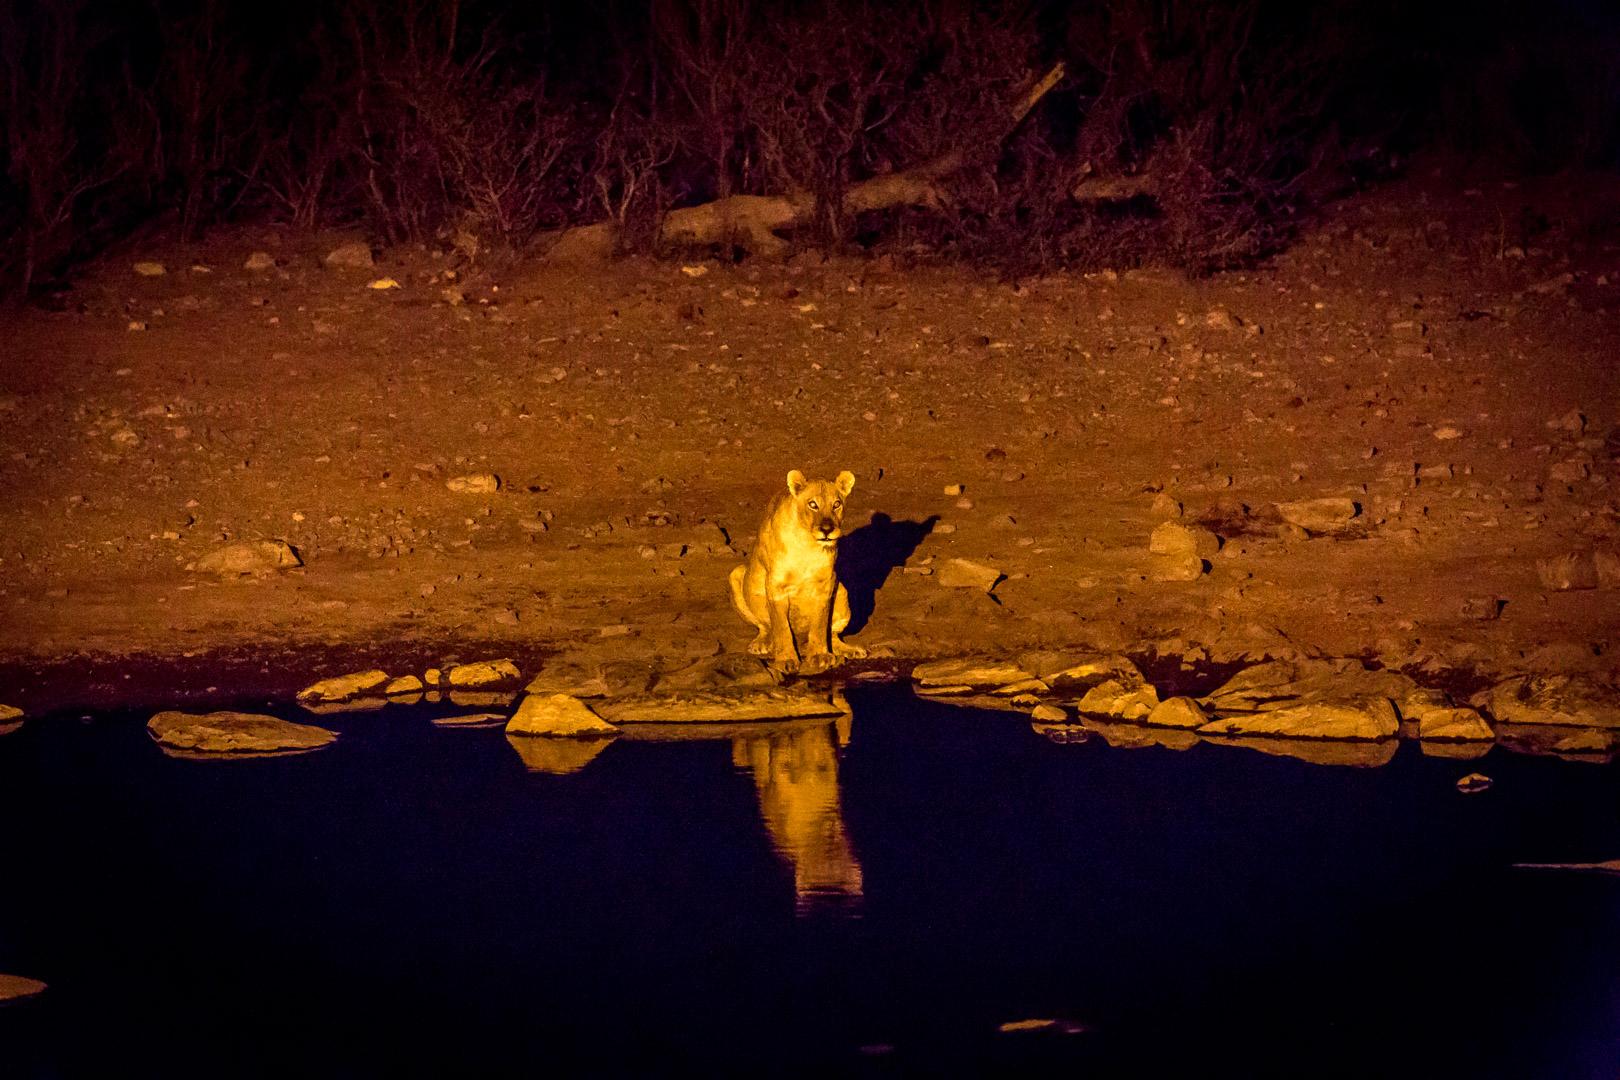 26.7. Moringa Waterhole, Halali - Löwen